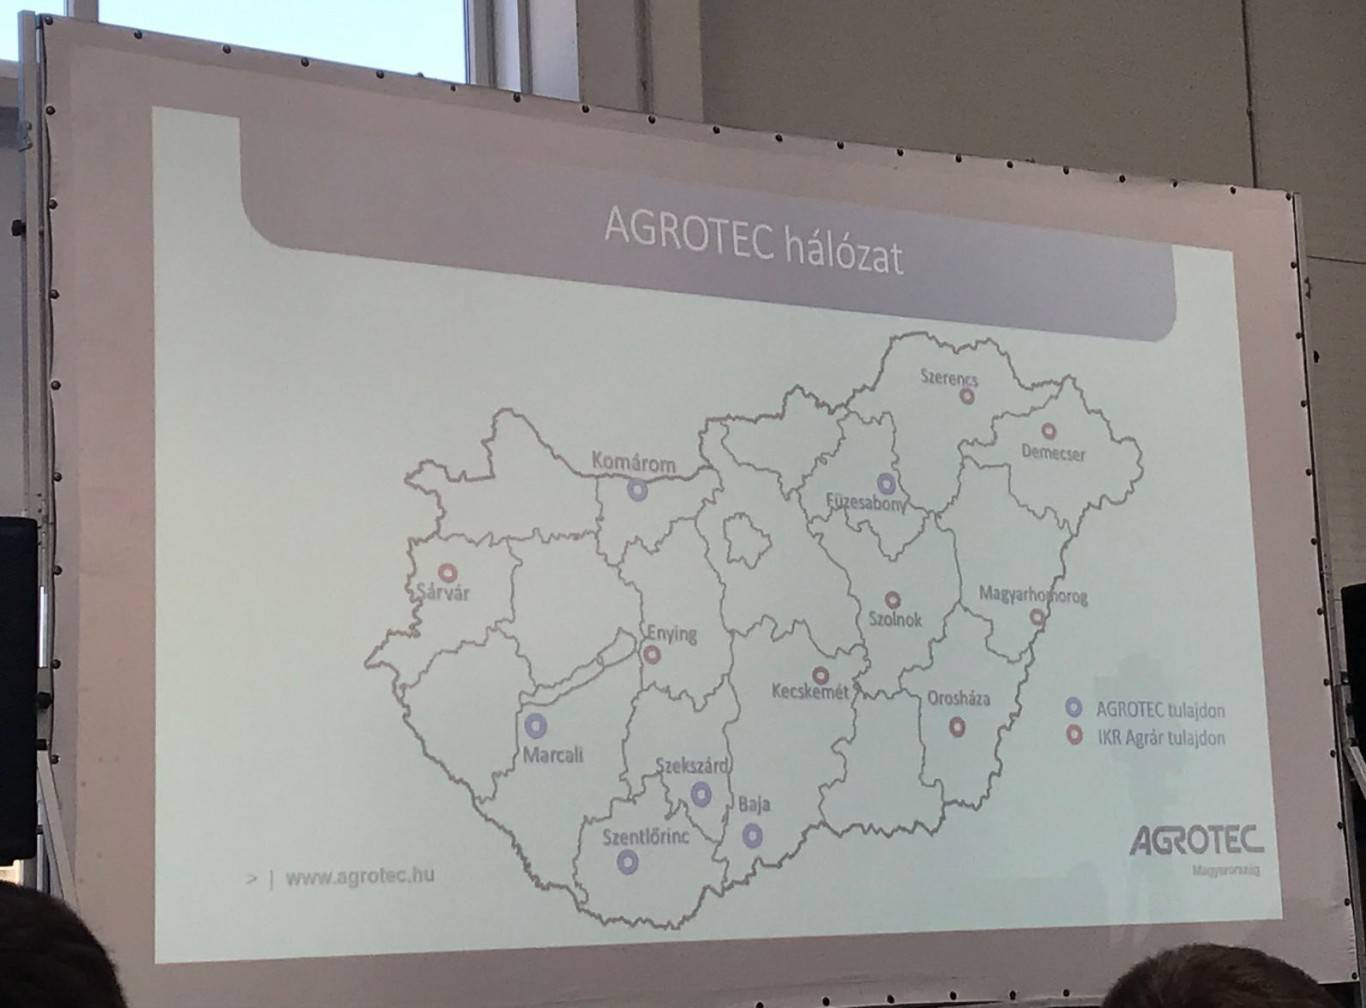 agrotec-halozat-img_5227